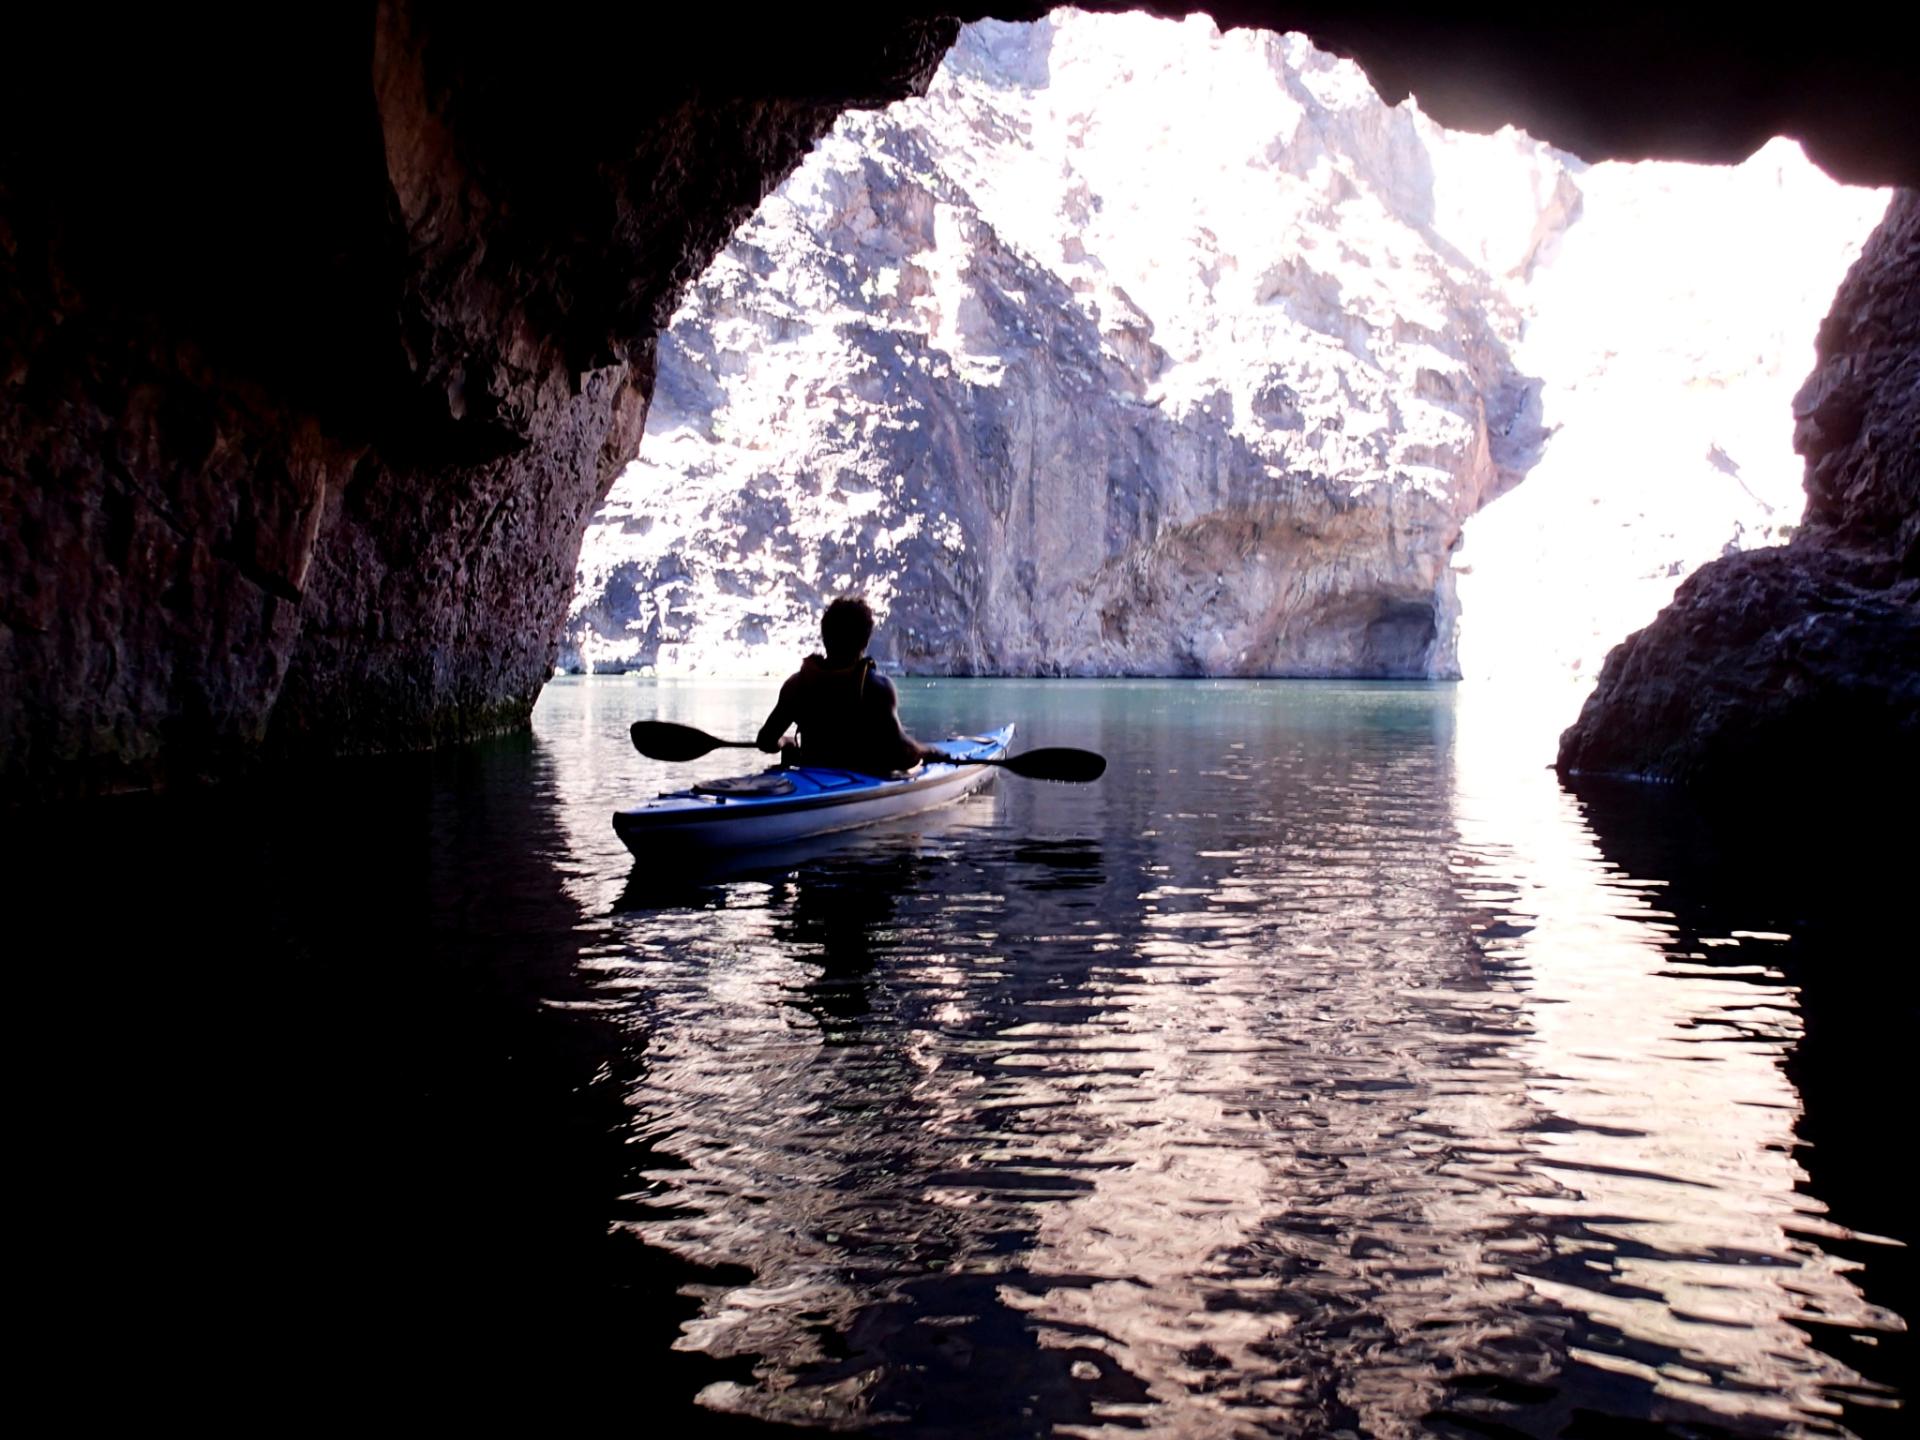 Alex from Brazil in Emerald Cave